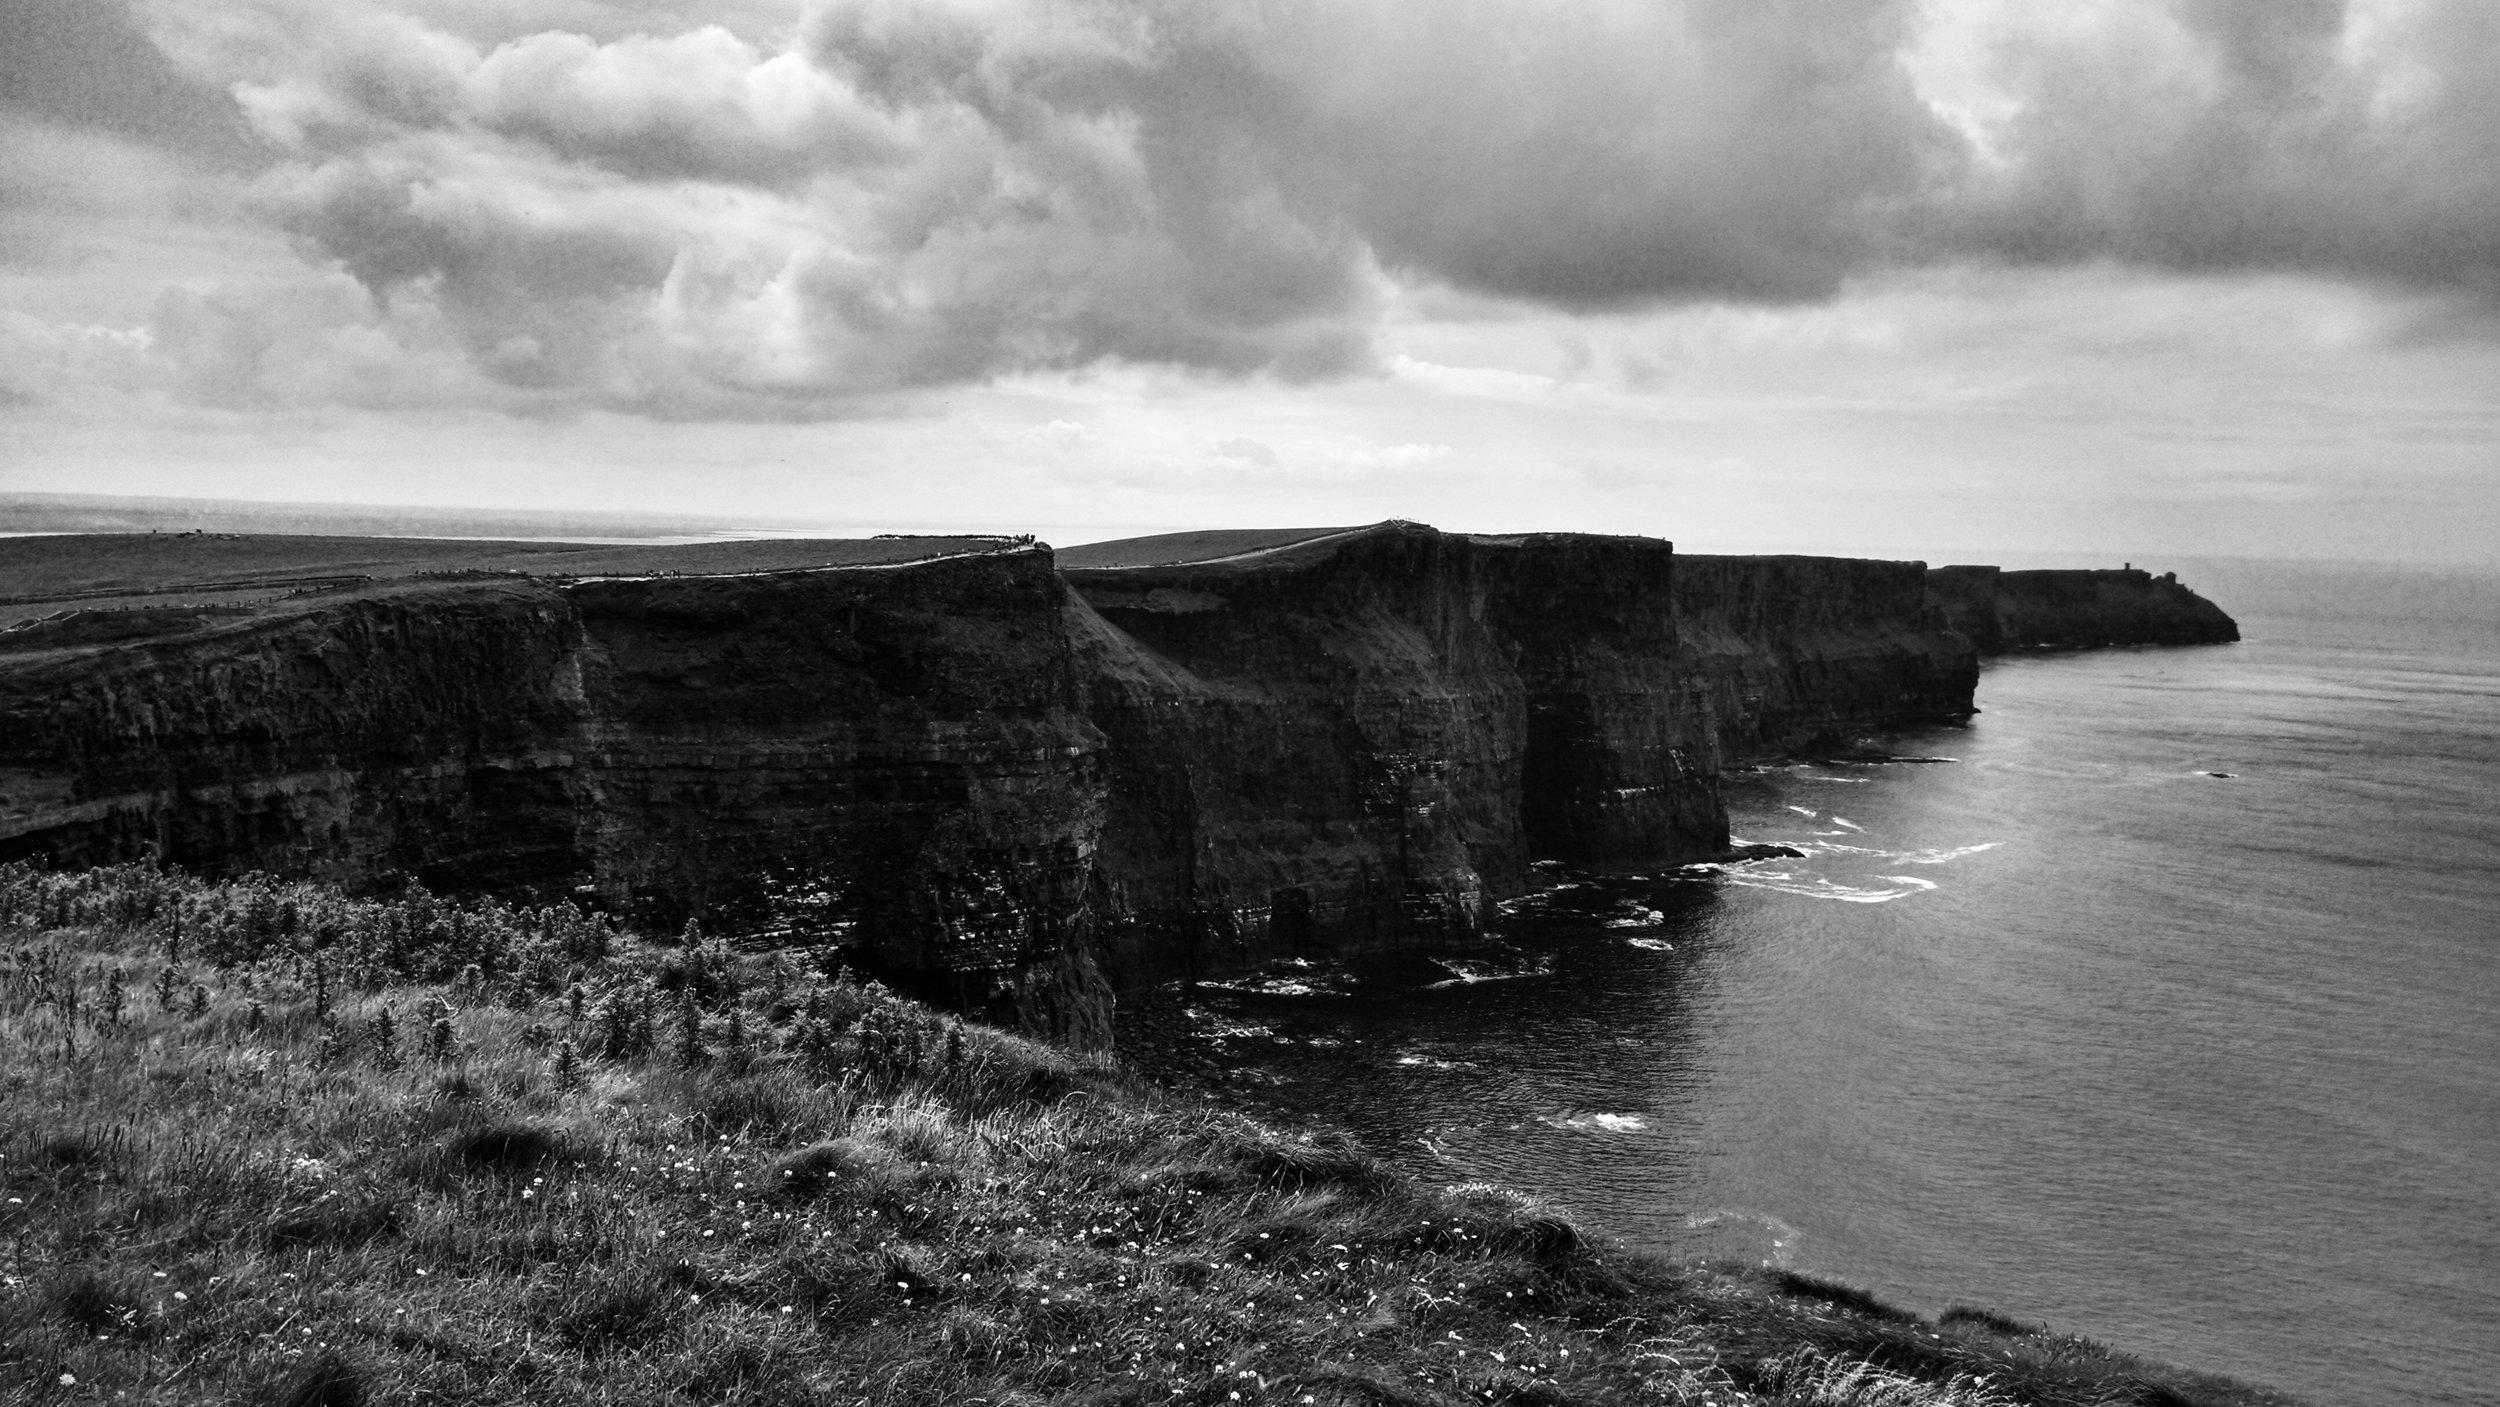 Cliffs of Moher - James McCarey